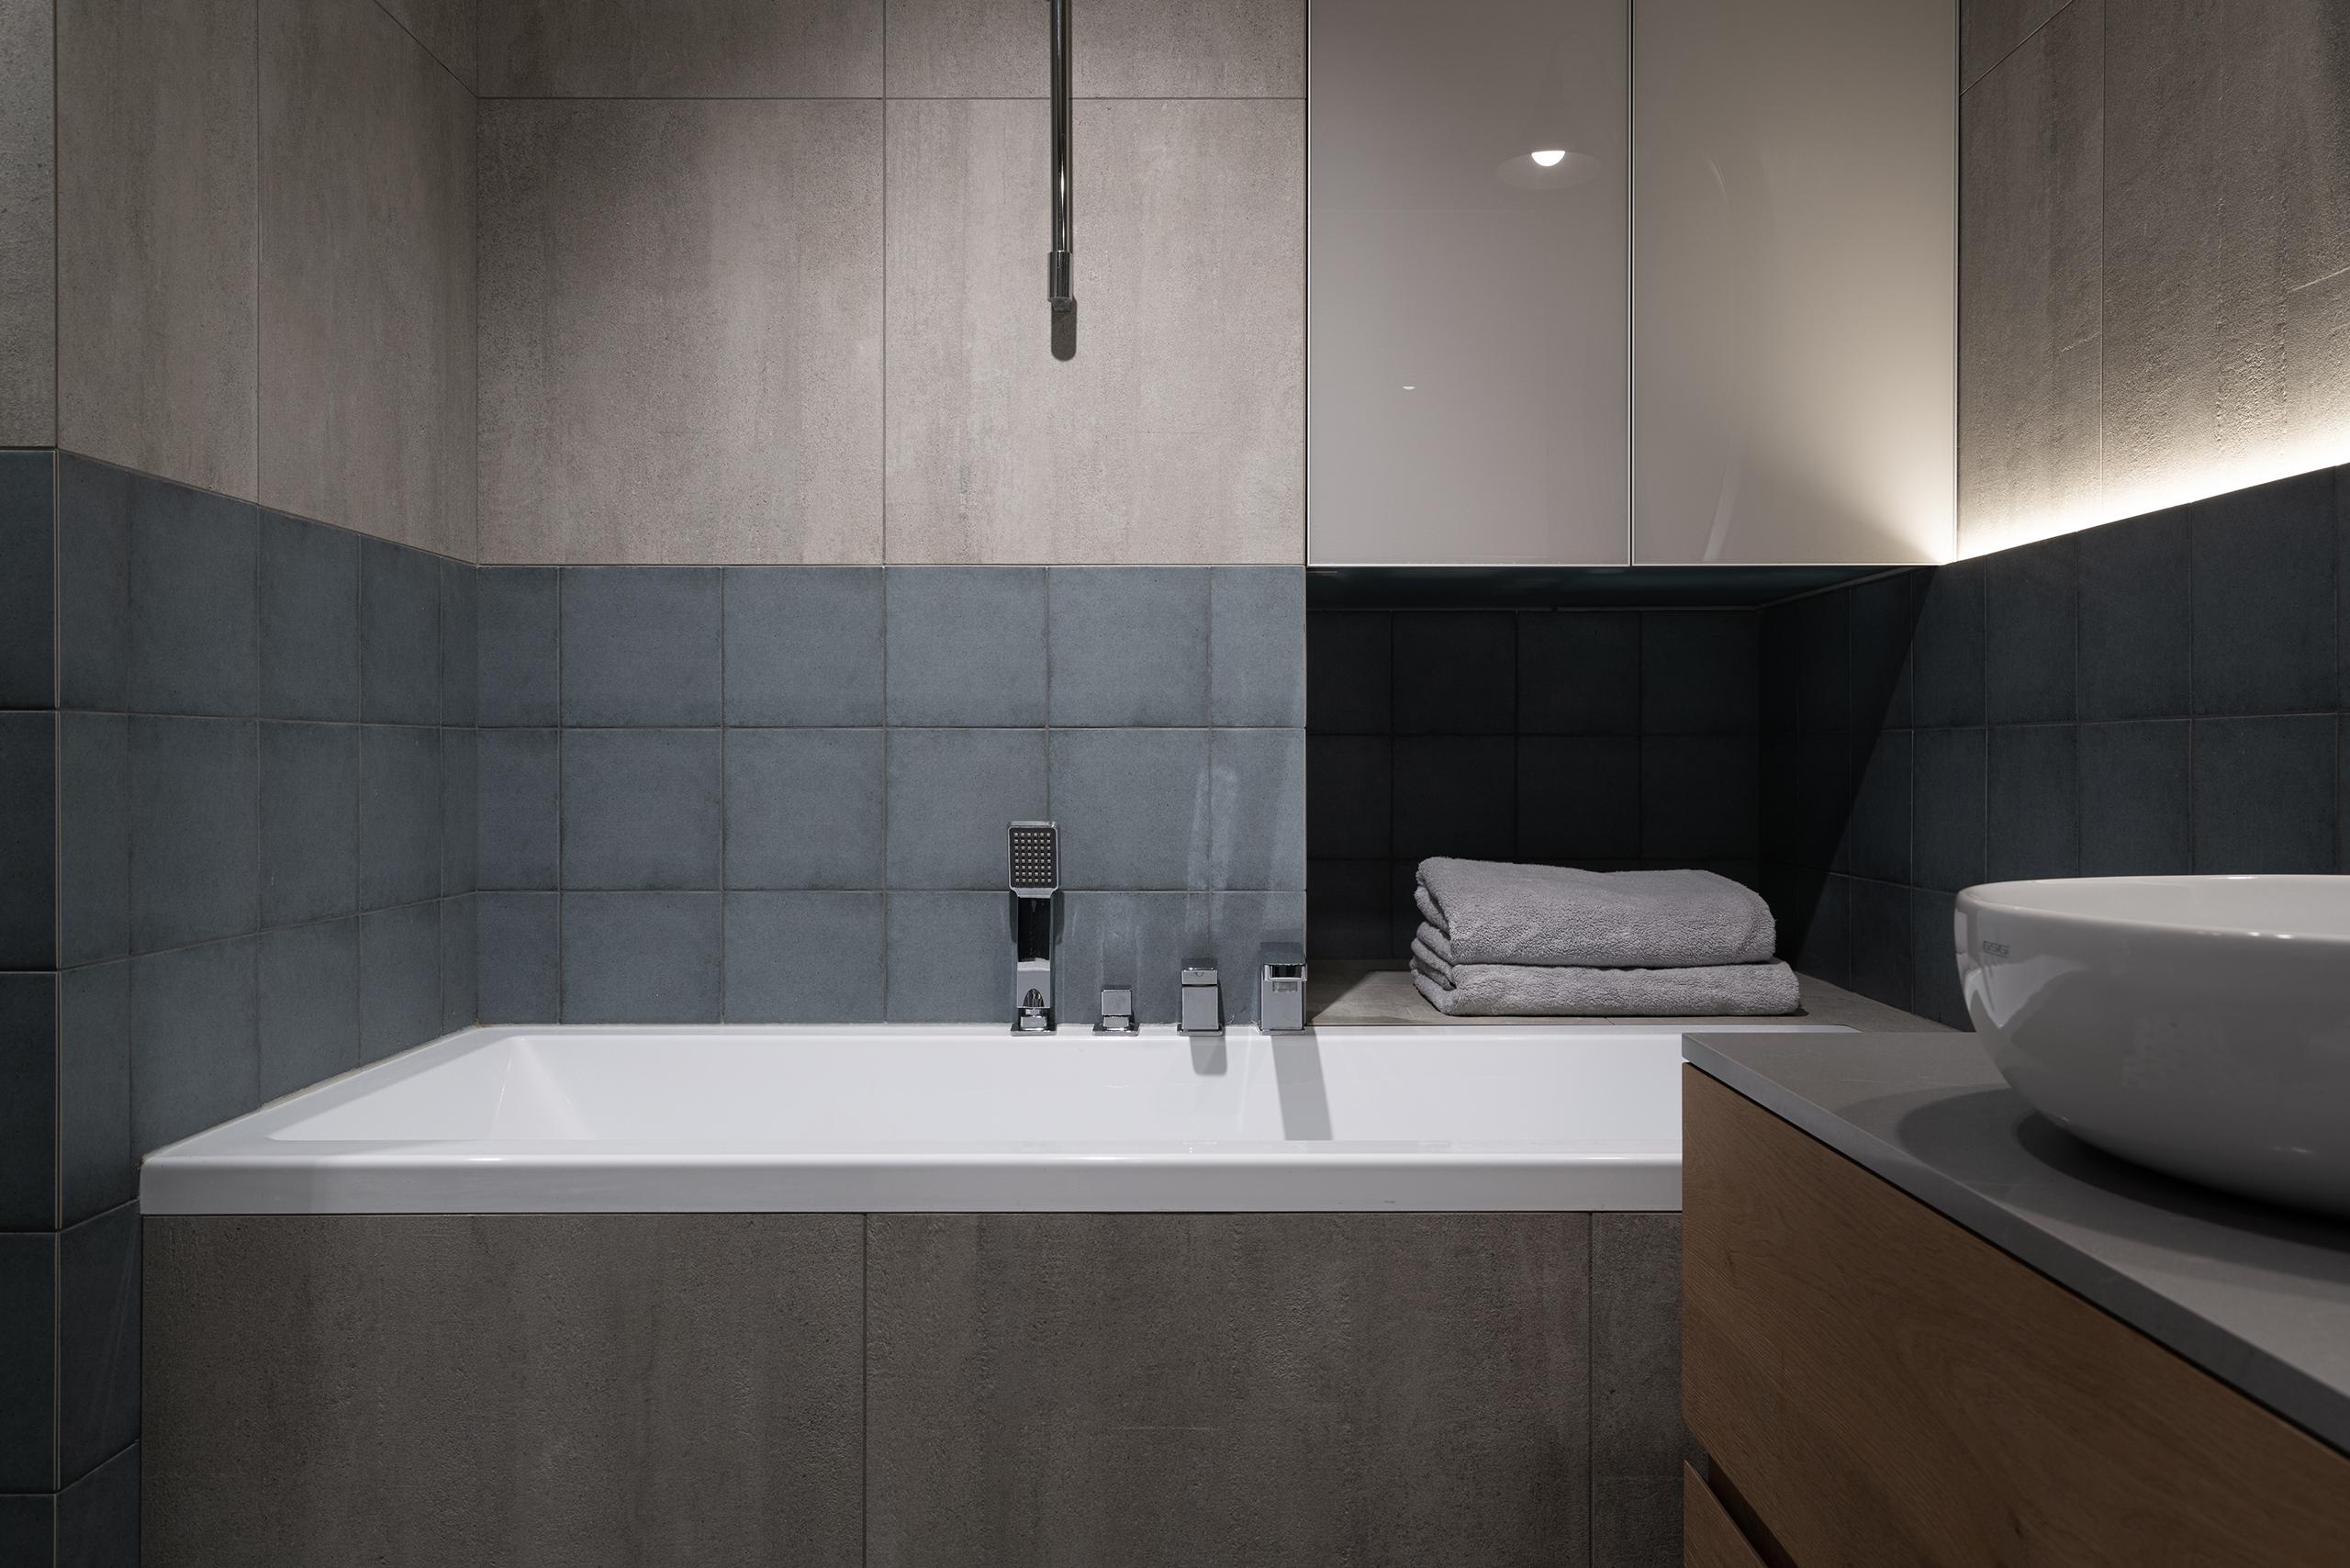 Фотосъемка интерьера ванной комнаты проект Авангард